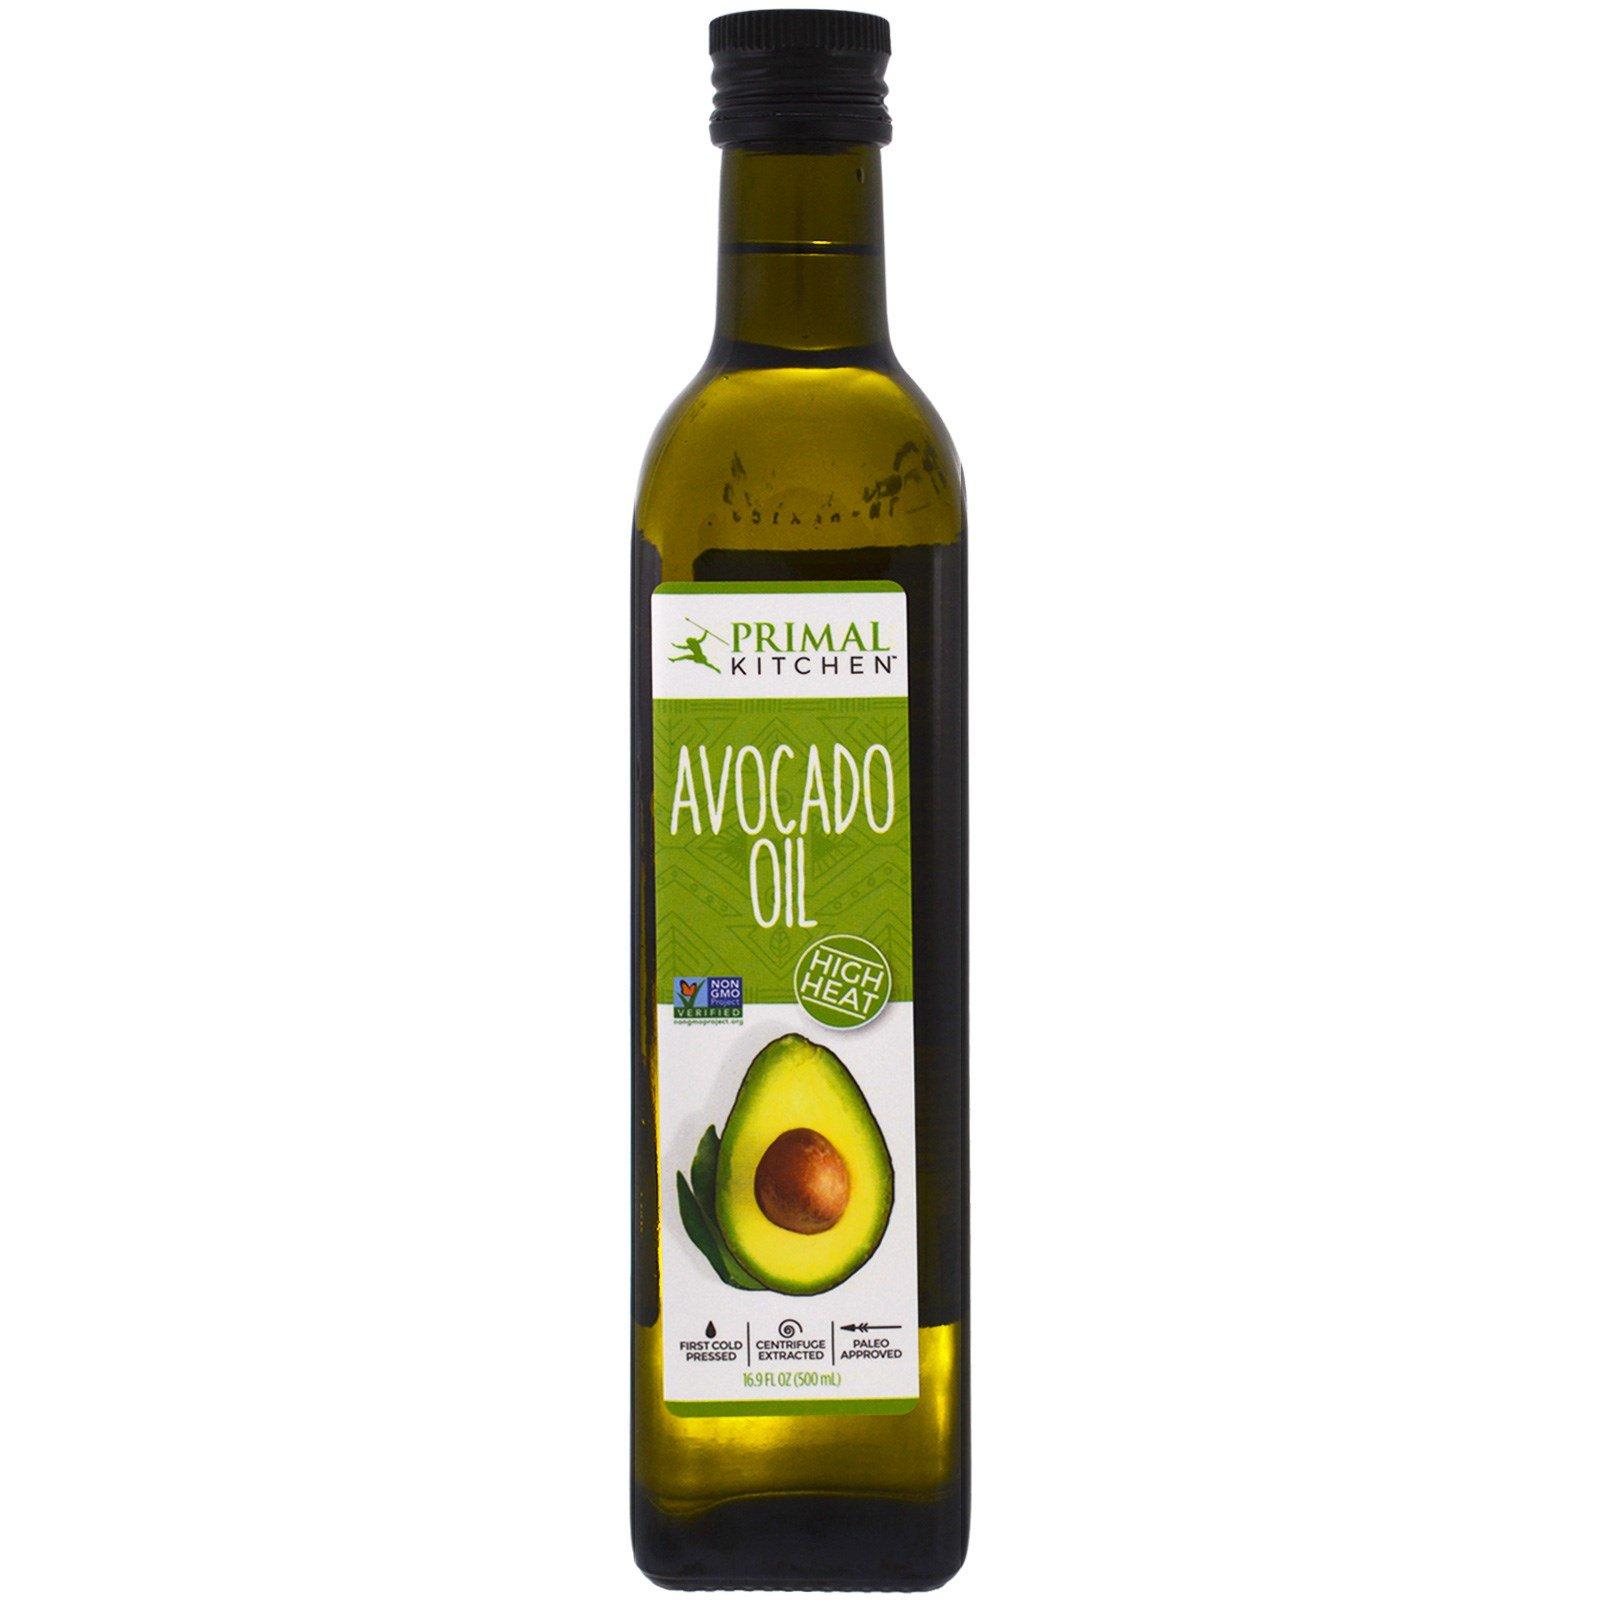 Primal Kitchen, Avocado Oil, 16.9 fl oz (500 ml) - iHerb.com